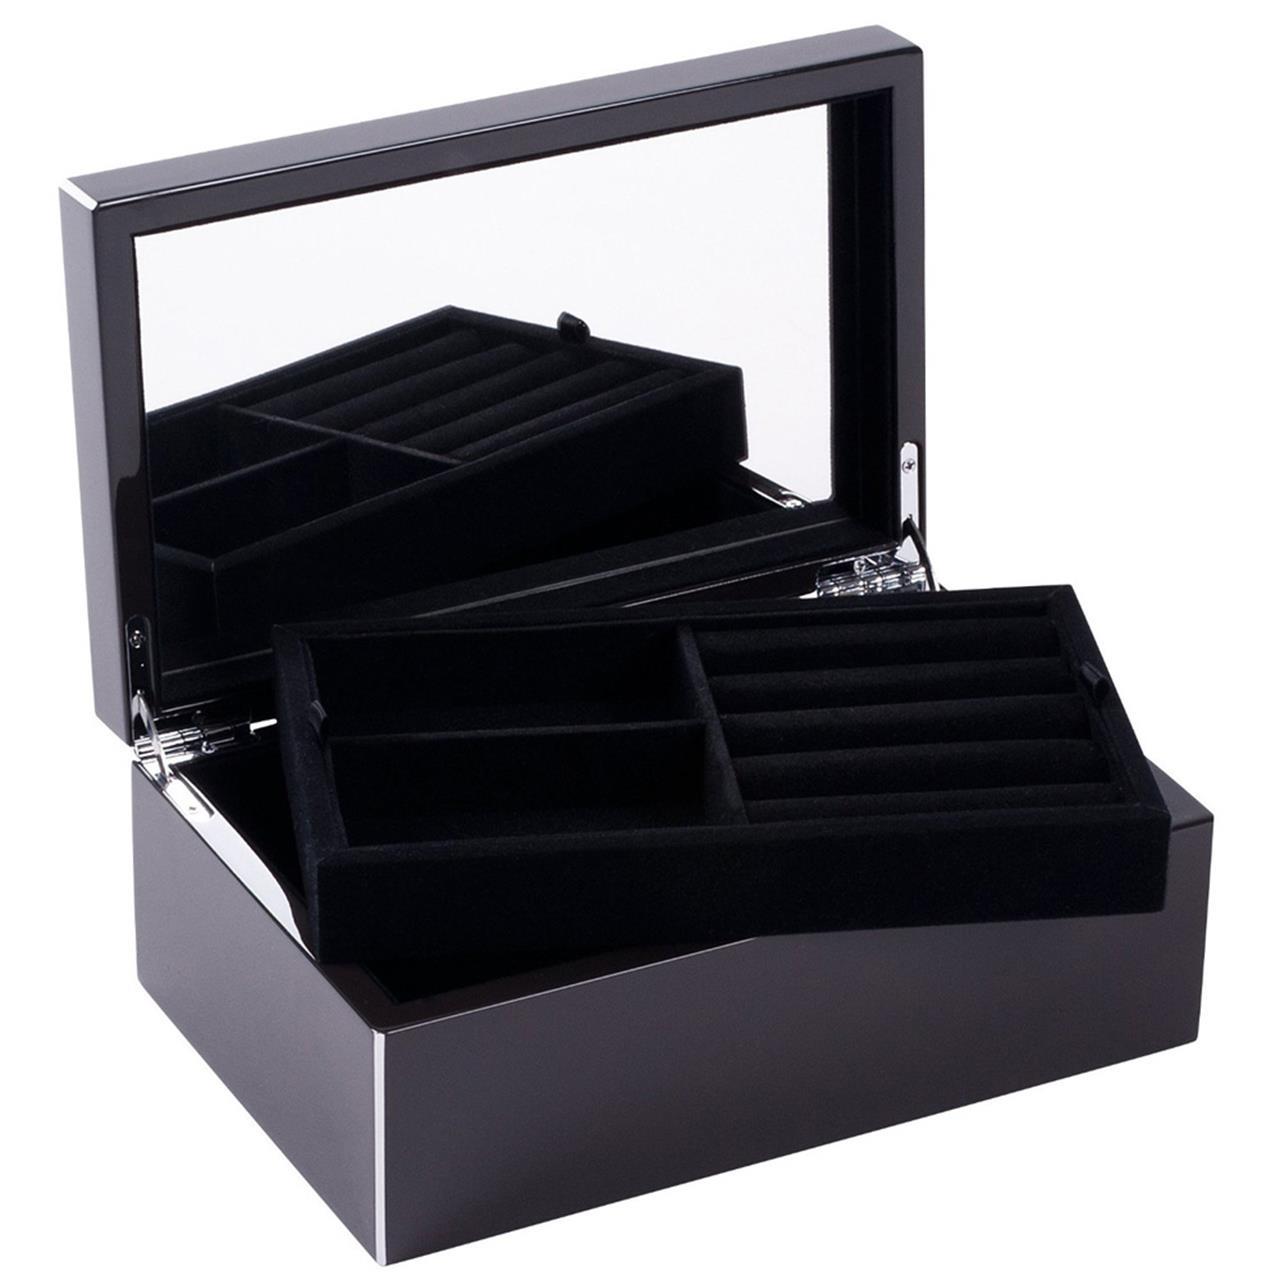 gift company tang schmuckbox klein praline brown franzen d sseldorf onlineshop. Black Bedroom Furniture Sets. Home Design Ideas